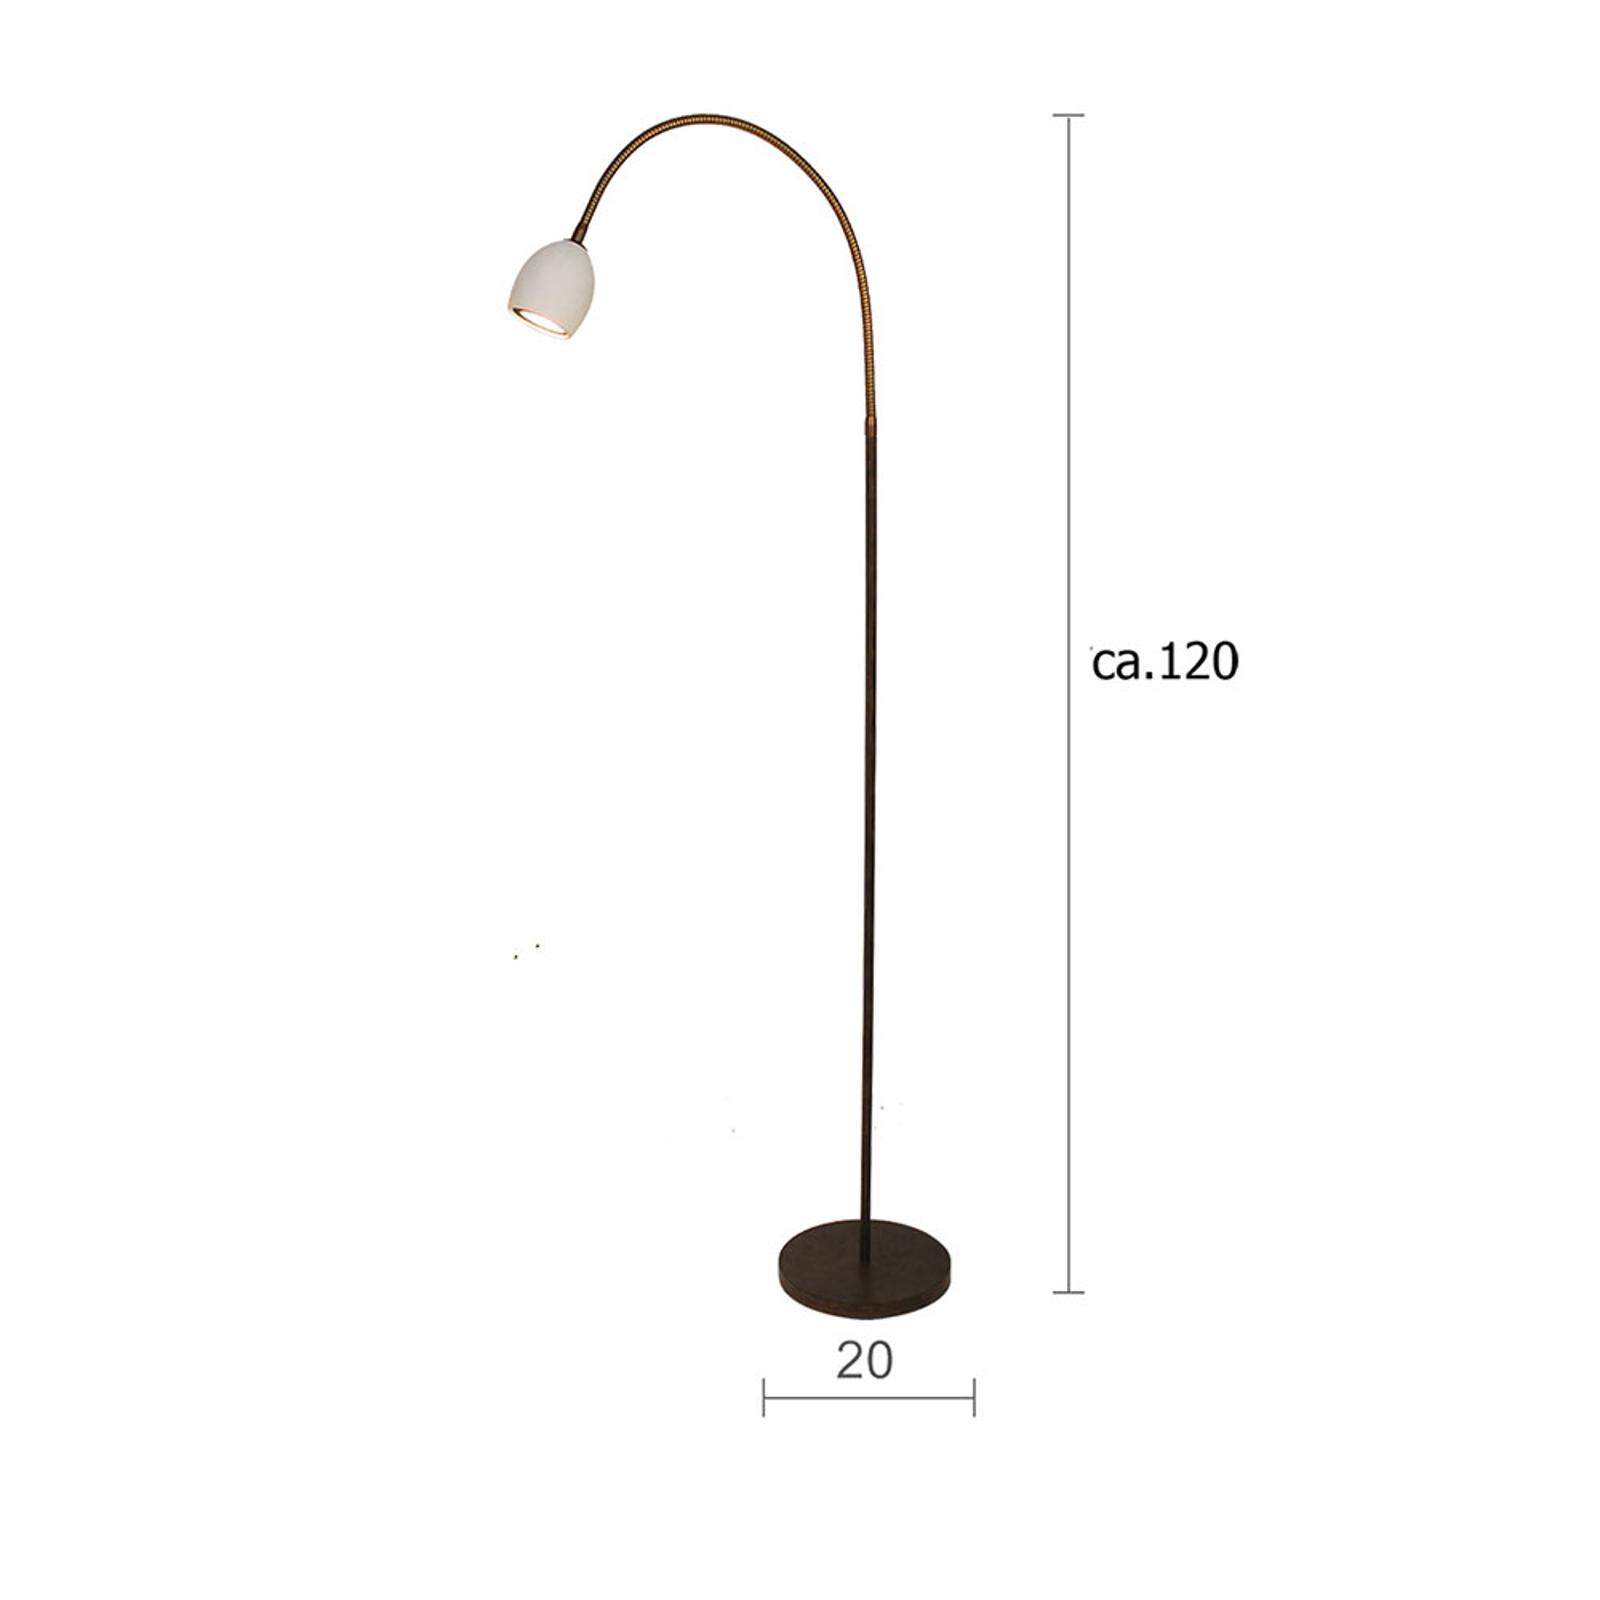 Menzel Provence mat vloerlamp 1-lamp flexibele arm